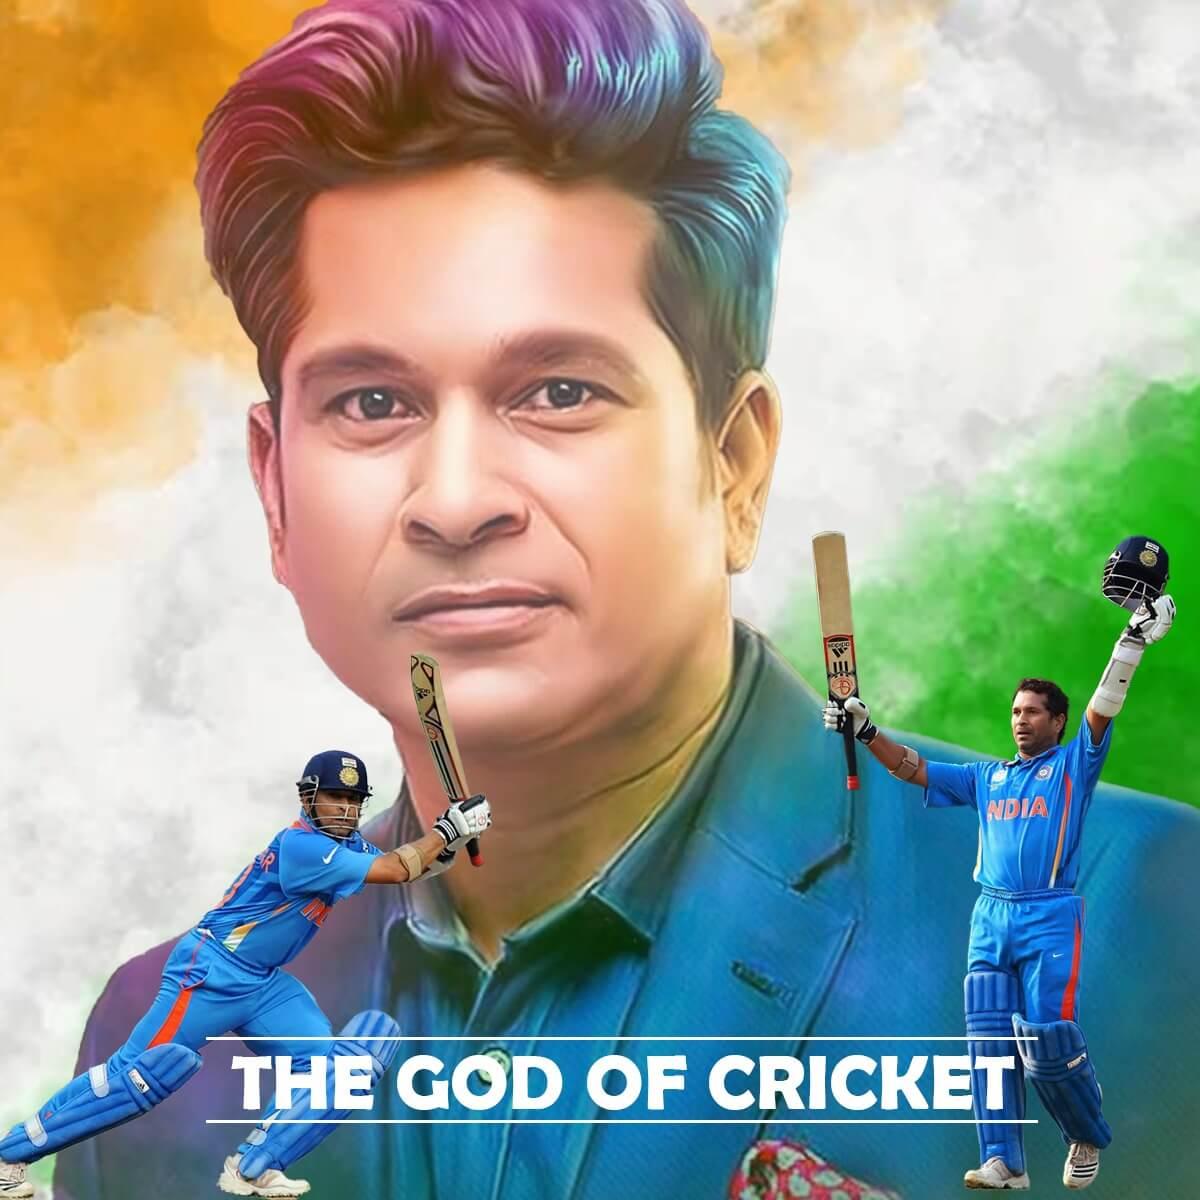 Sachin Tendulkar: The god of cricket